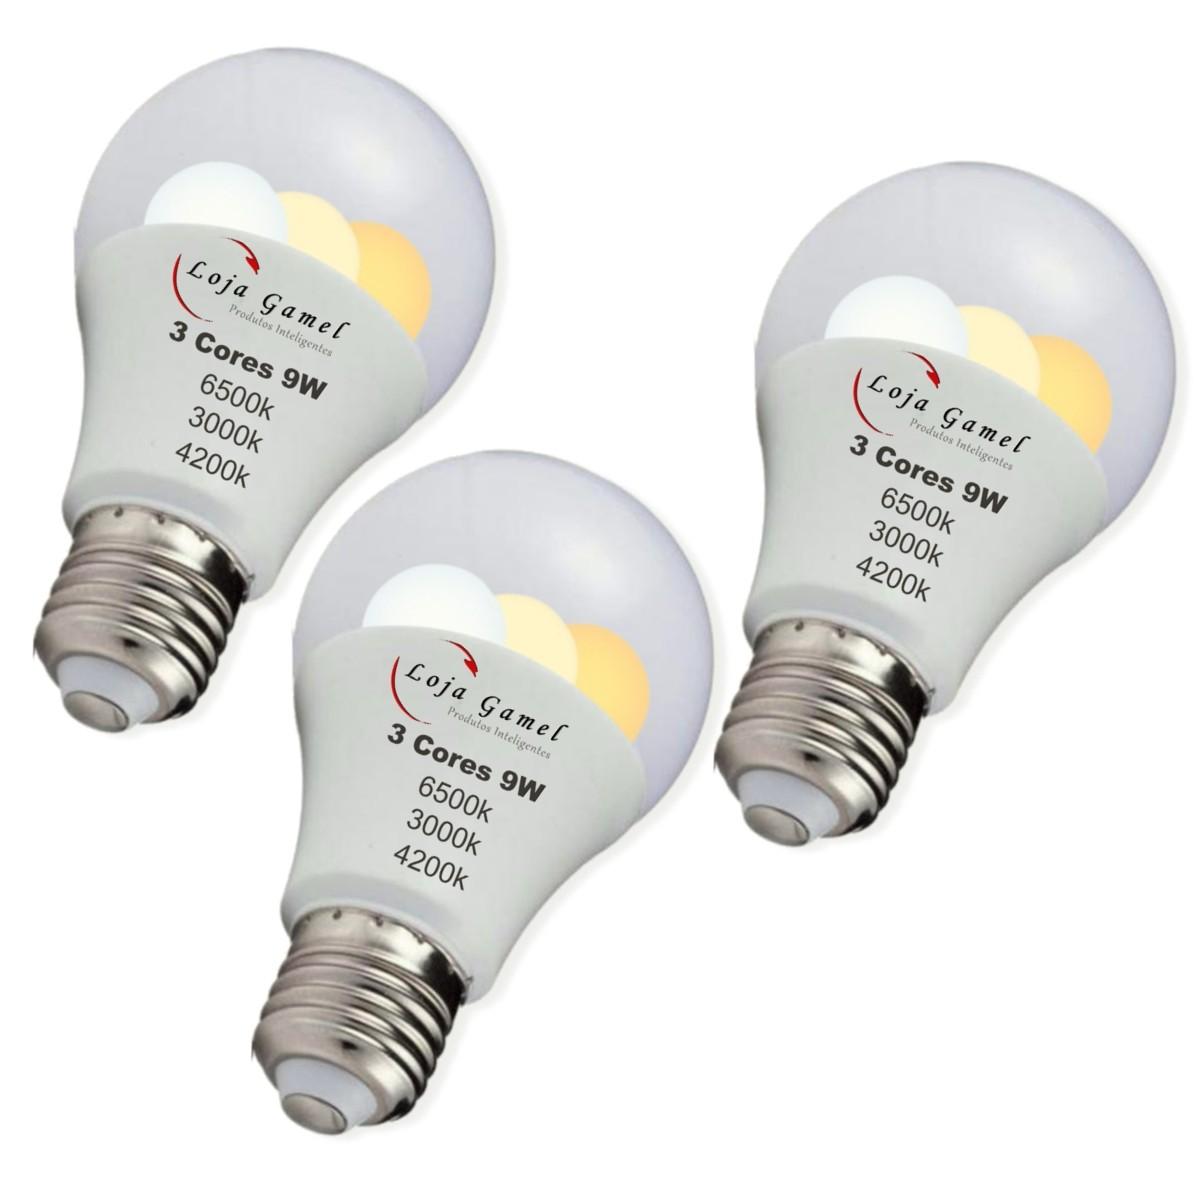 Foto 1 - Lâmpada Led Inteligente Bulbo 3 Cores Kit 3Un